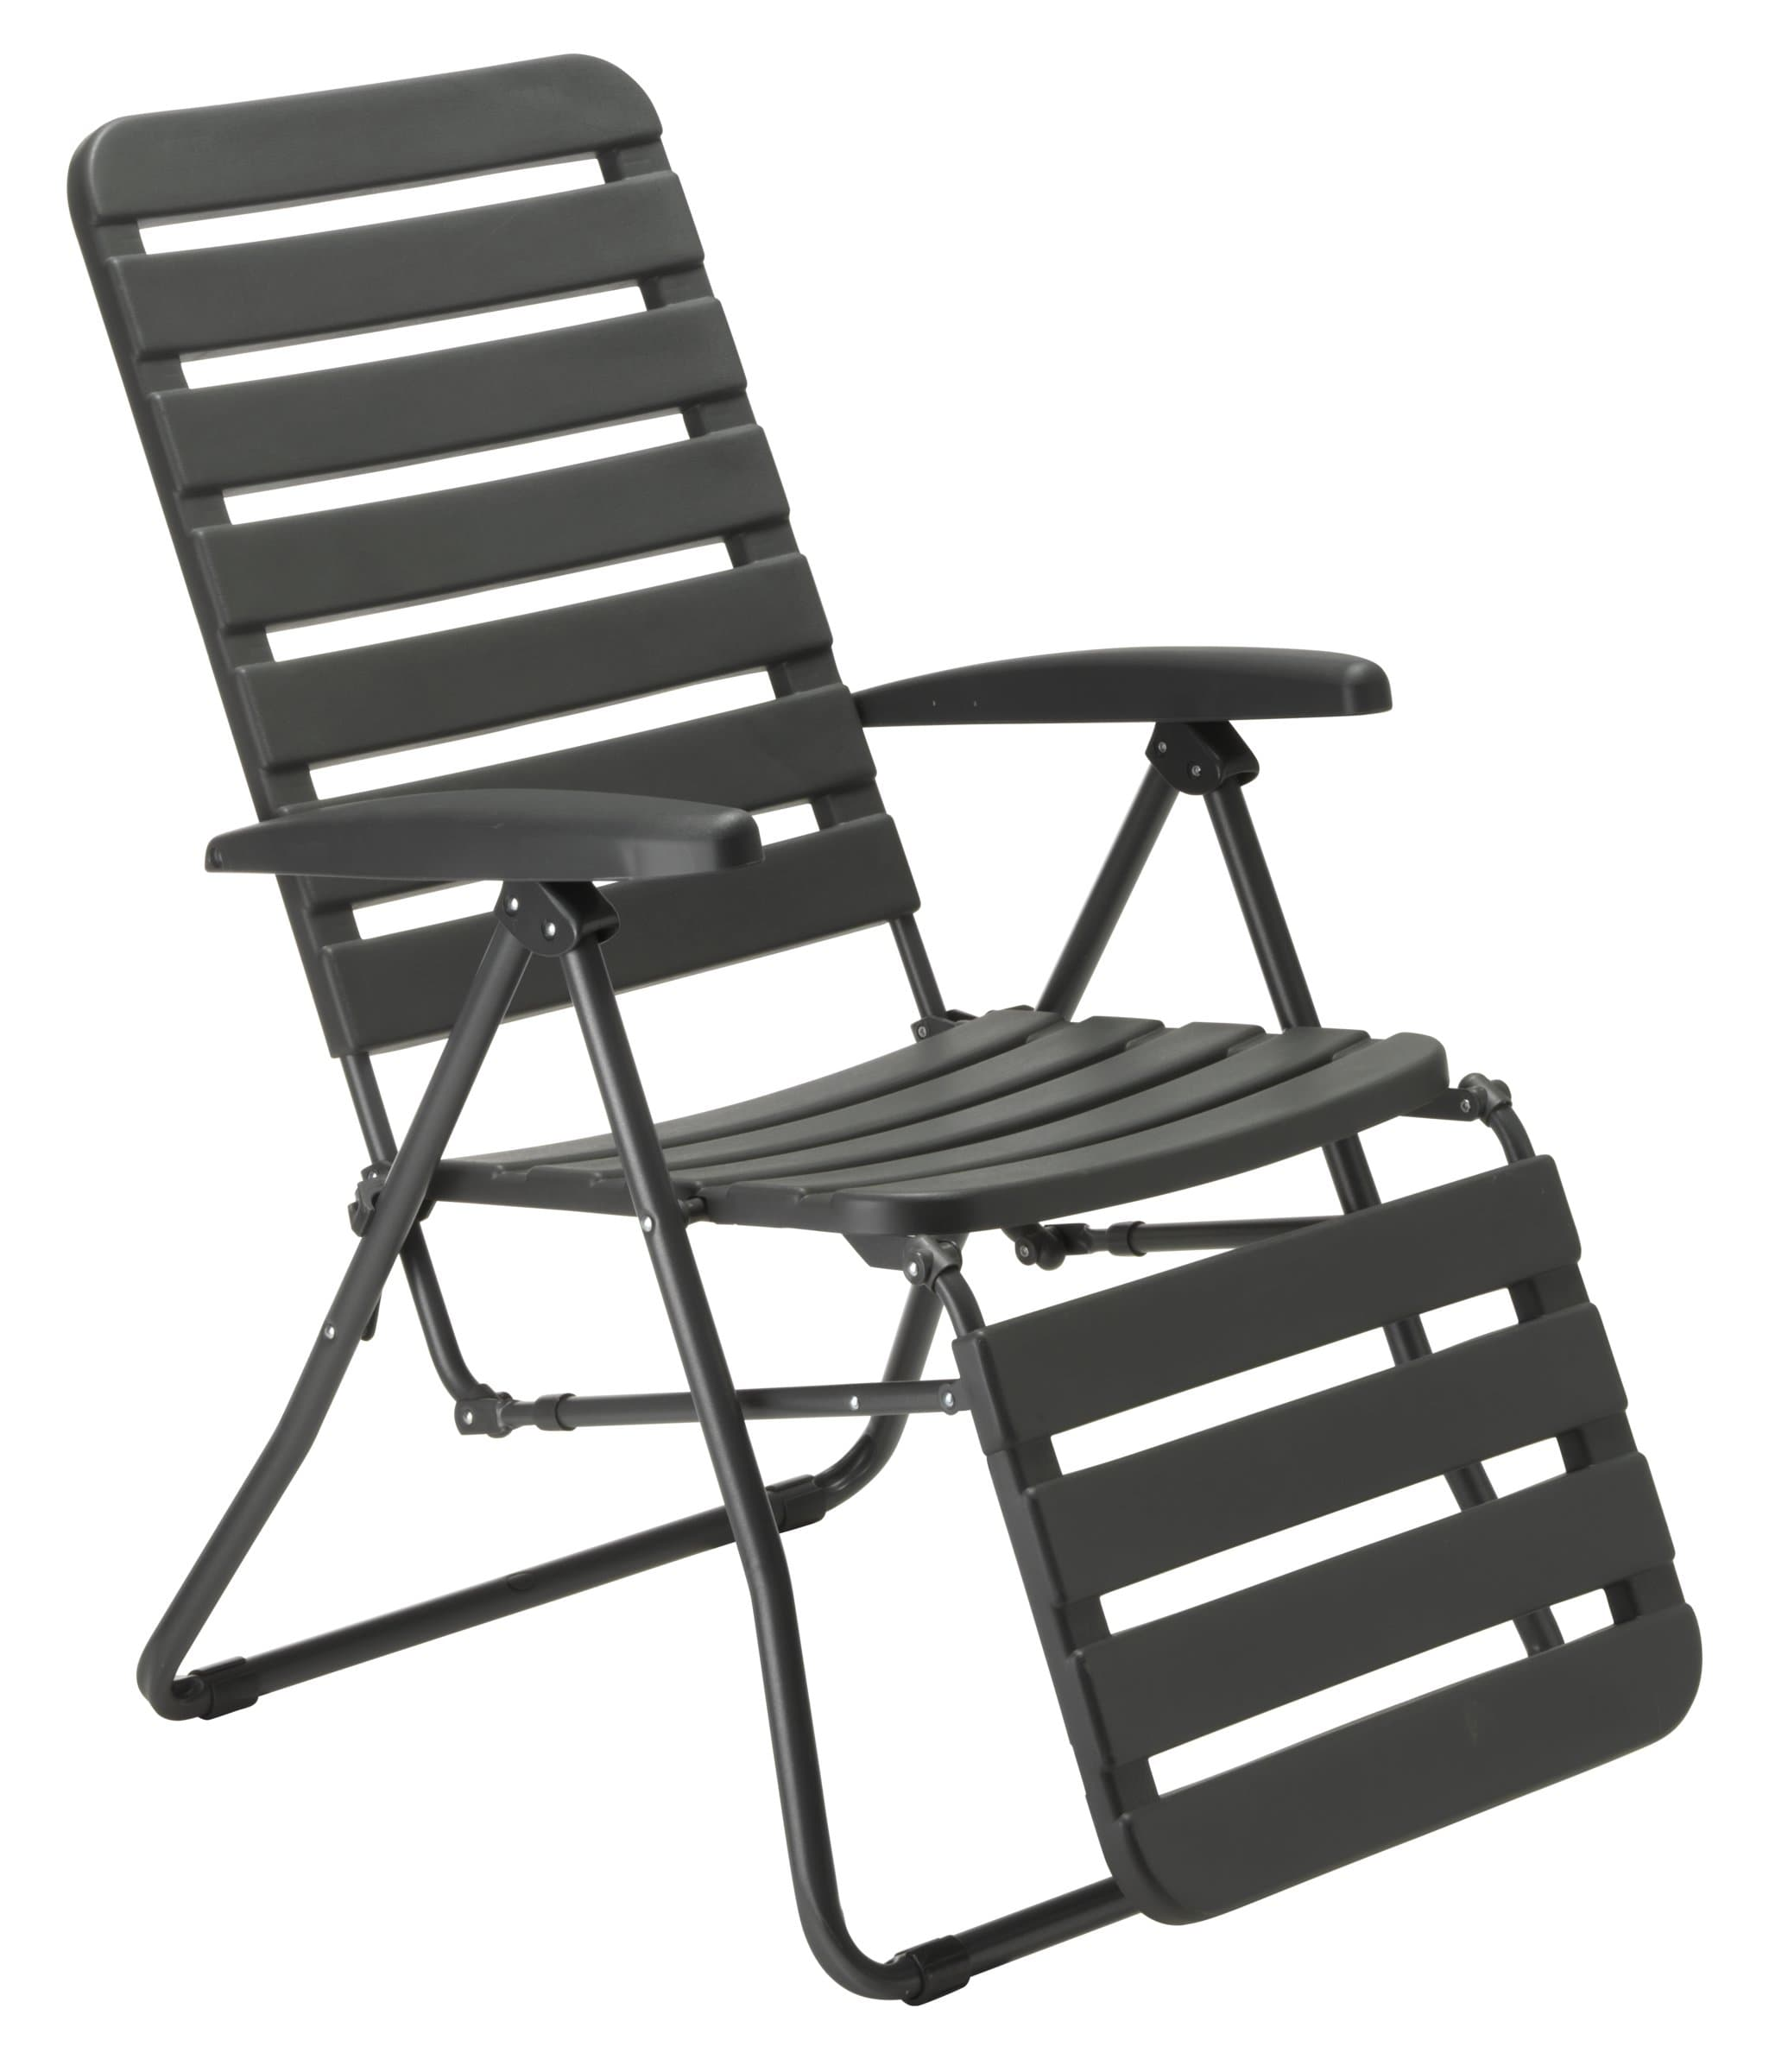 chaise longue relax tarifa migros. Black Bedroom Furniture Sets. Home Design Ideas